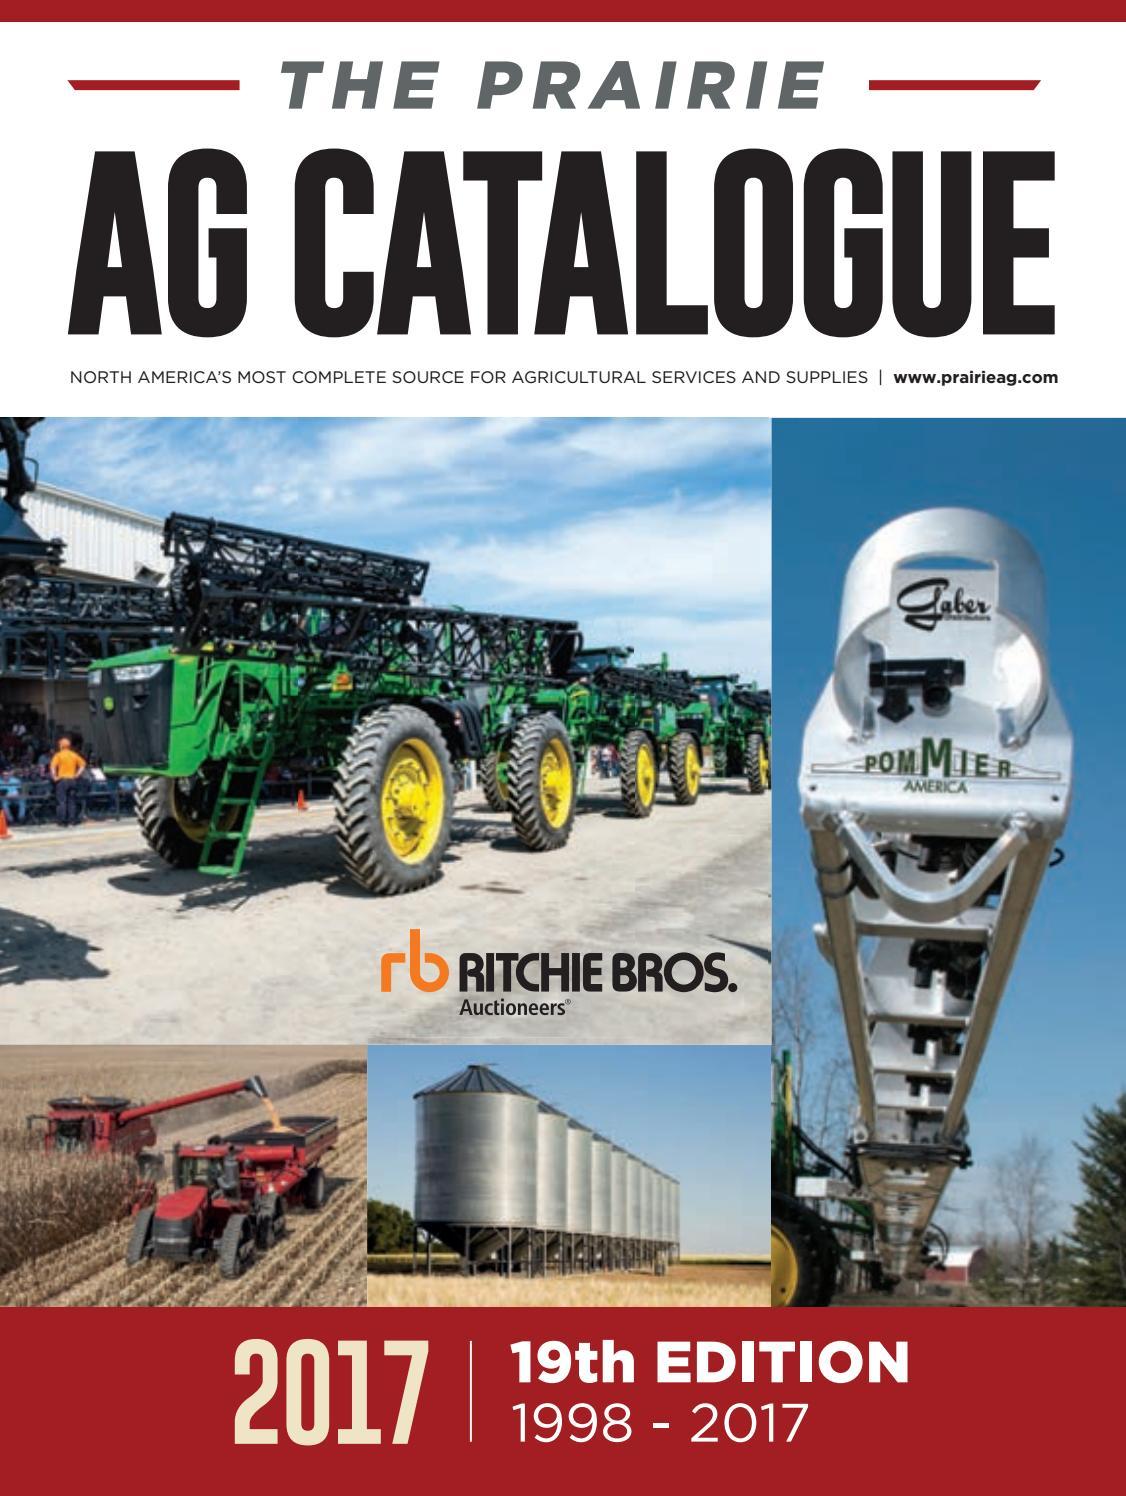 Prairie Ag Catalogue February 2017 By Farm Business Communications Summit Lighting 320 Ezee Change Photocell Control Adjusta Post Issuu